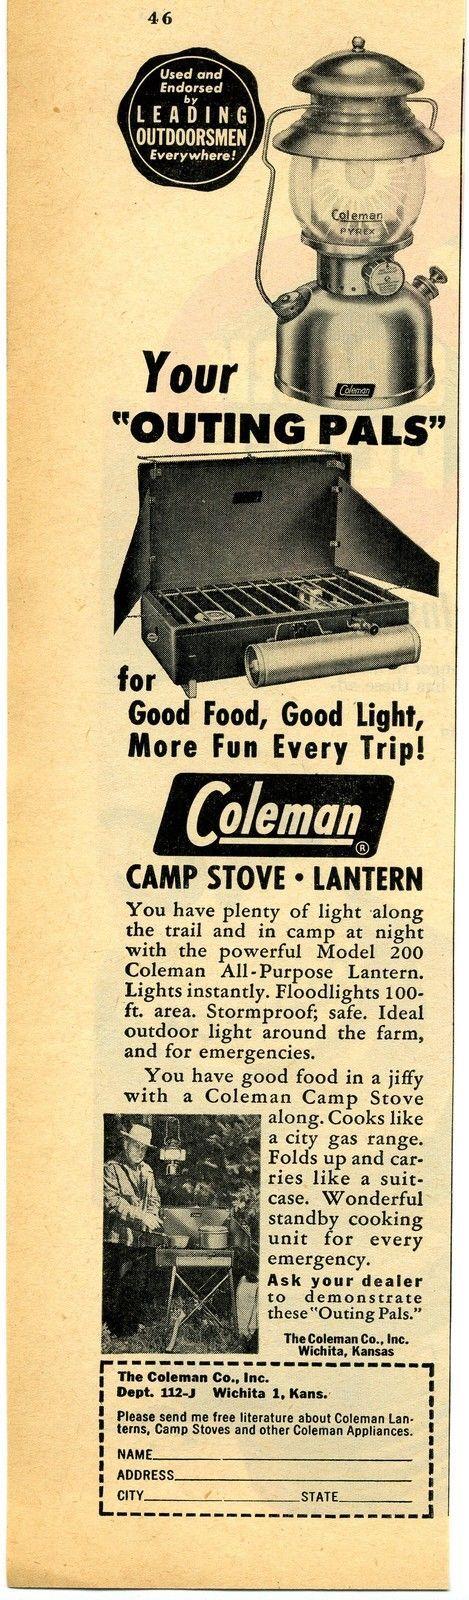 1952 Coleman Camping Camp Stove & Lantern